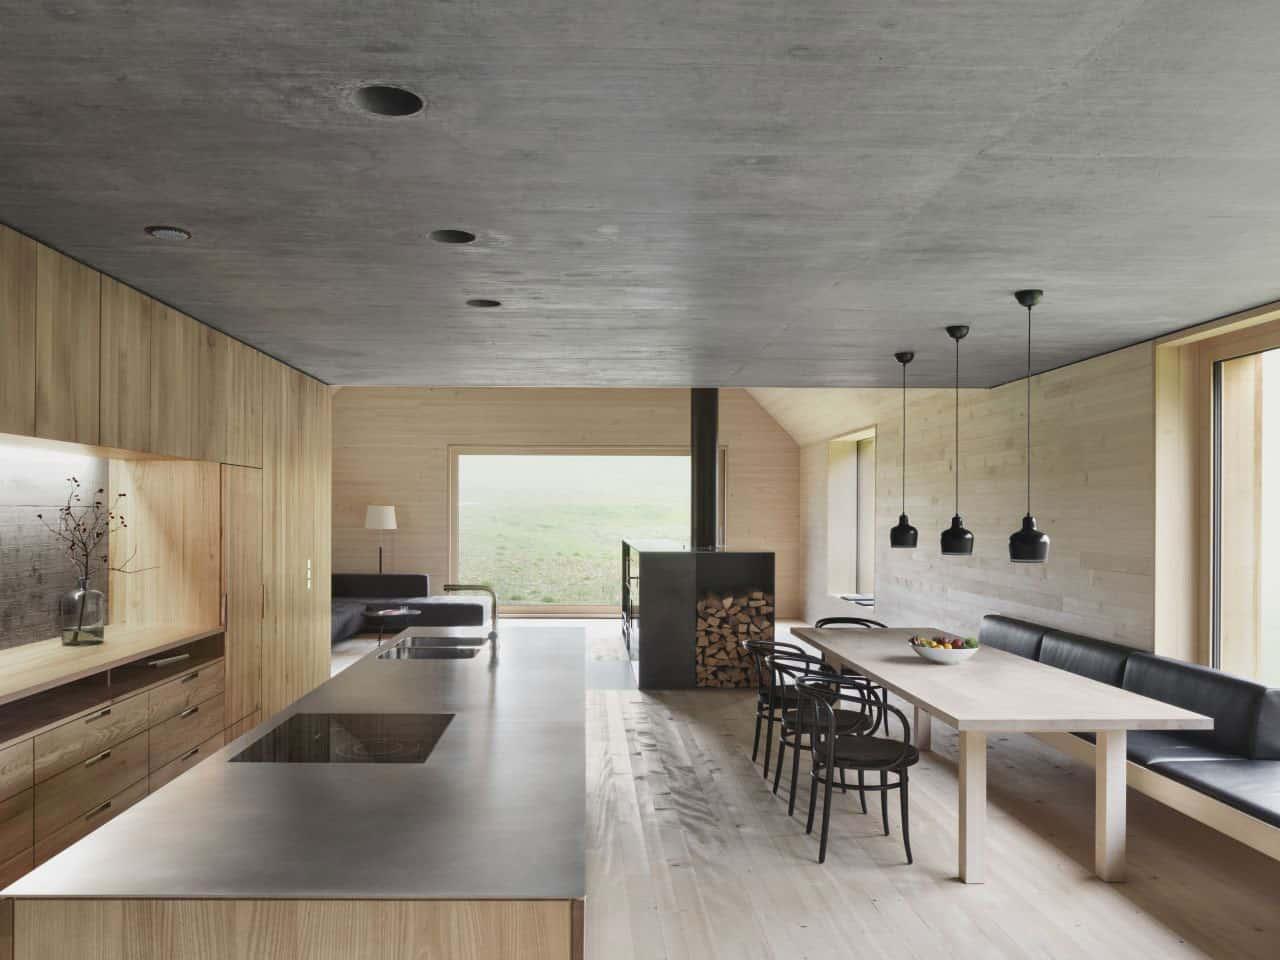 Haus am Moor by Bernardo Bader Architects